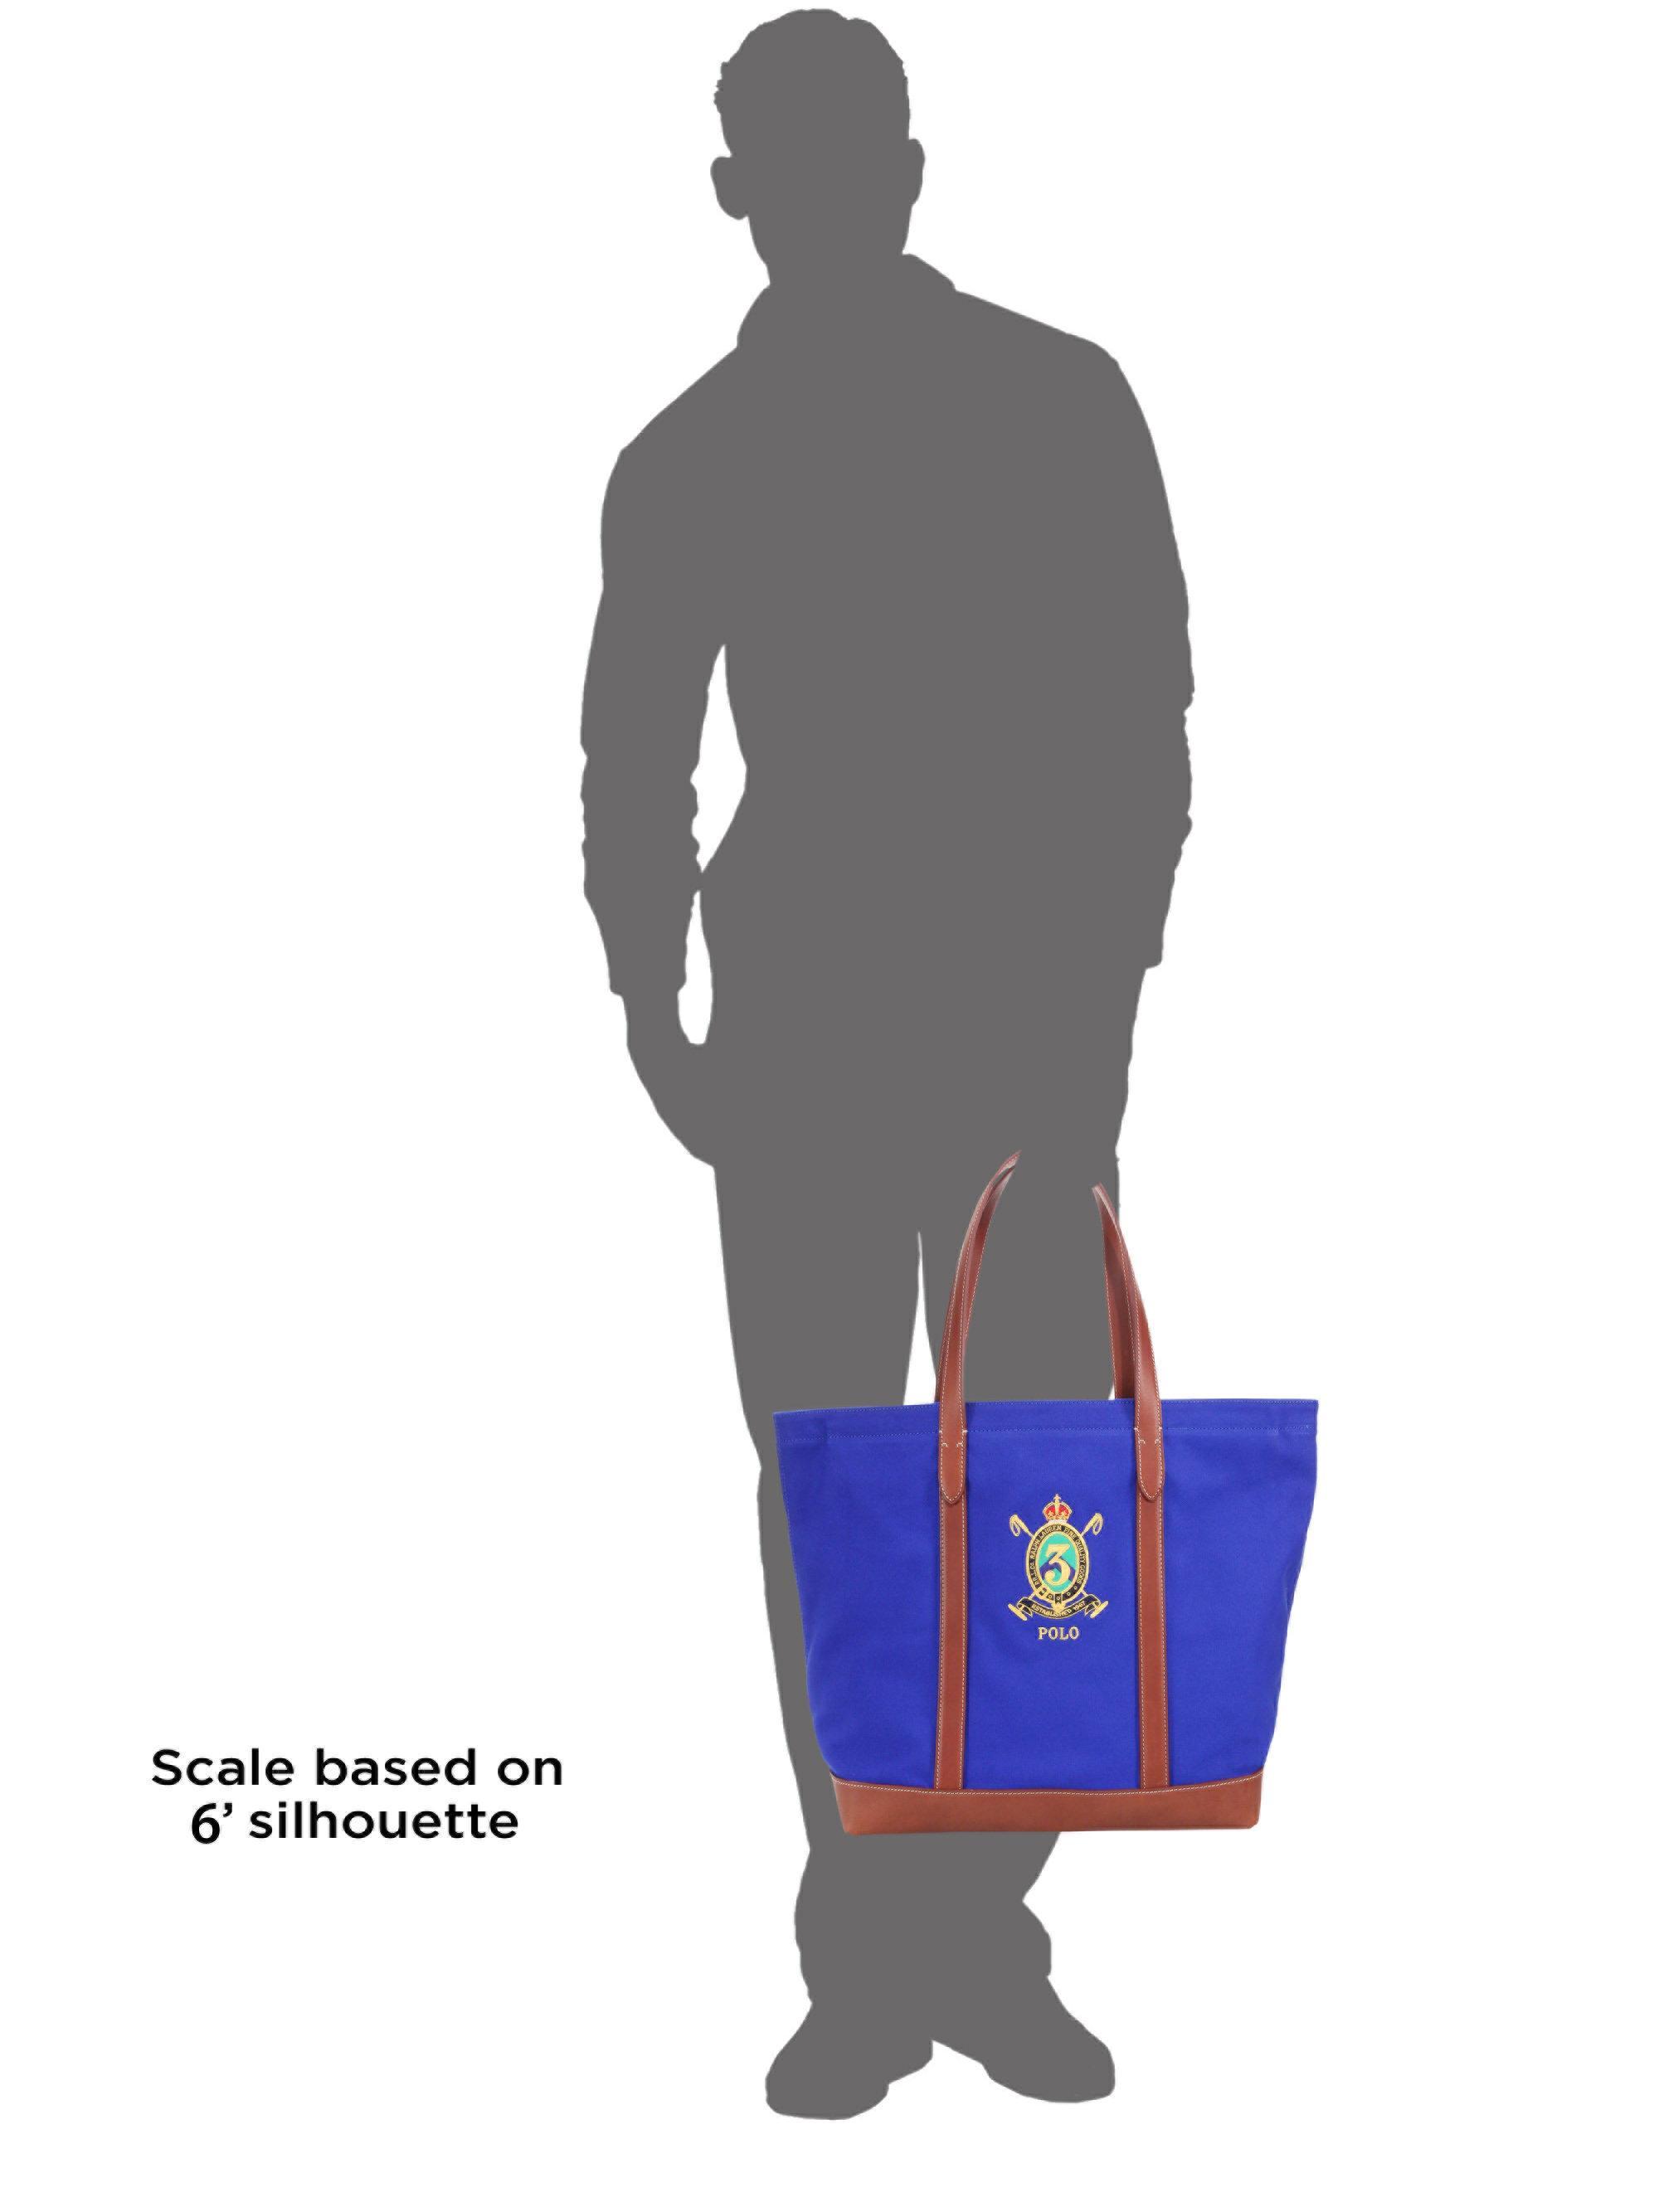 fd19f1a1e1f6 Polo Ralph Lauren Crest Canvas Tote in Blue for Men - Lyst